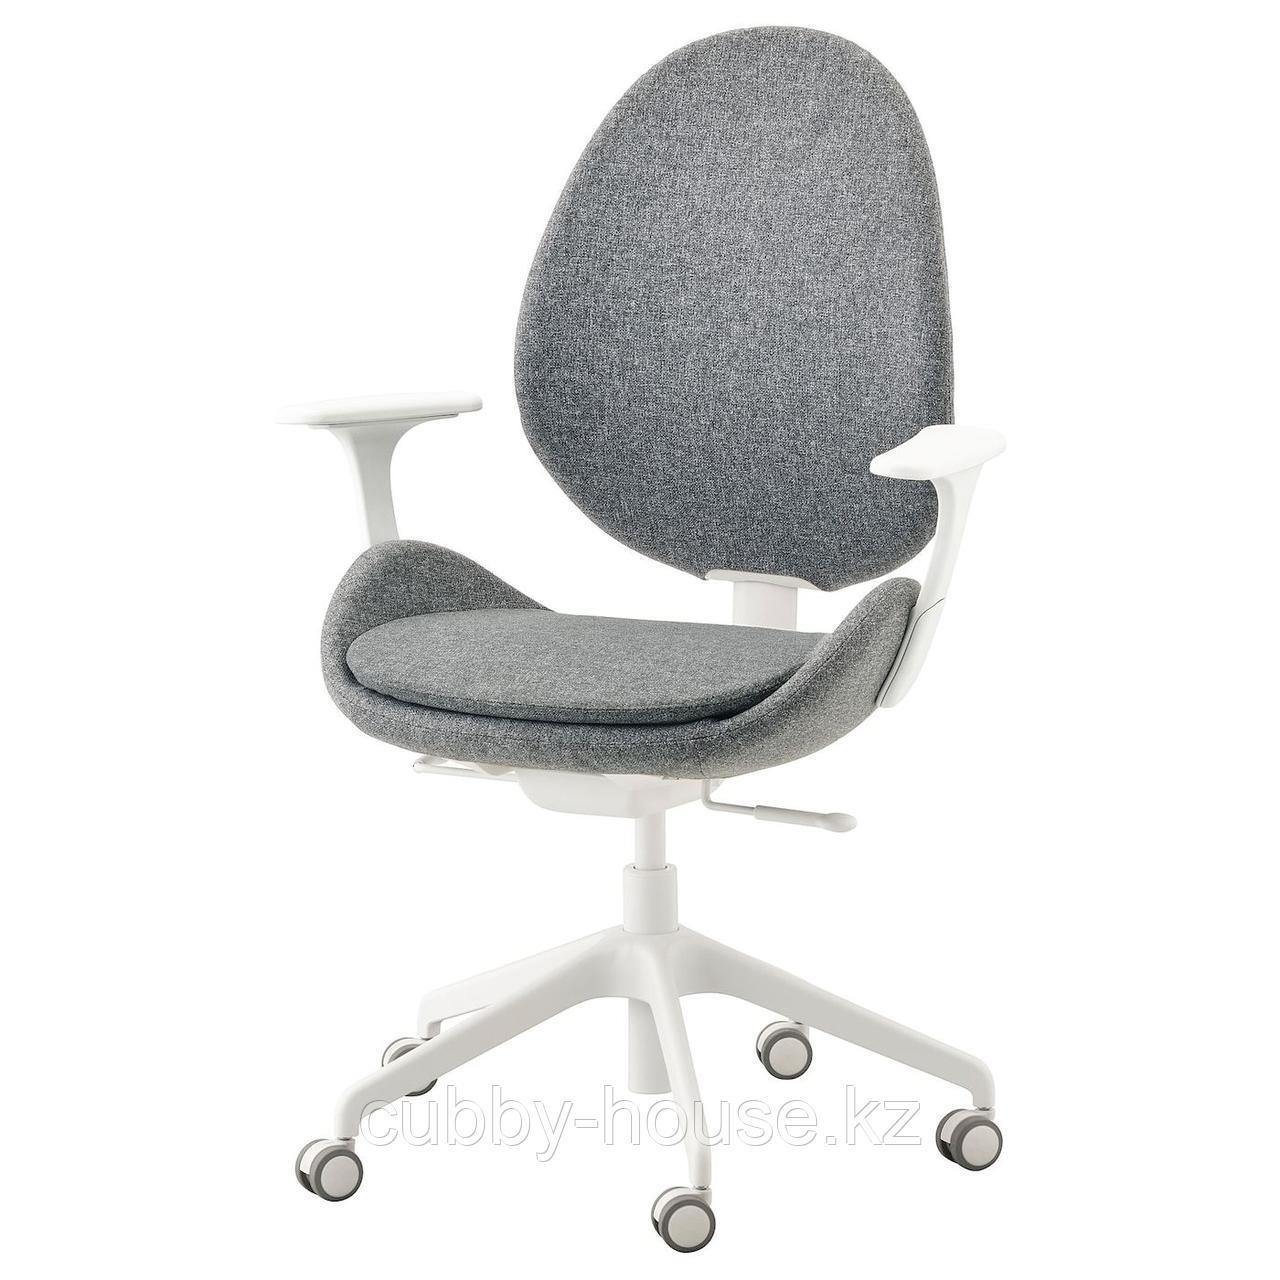 ХАТТЕФЬЕЛЛЬ Рабочий стул с подлокотниками, Гуннаред бежевый, белый